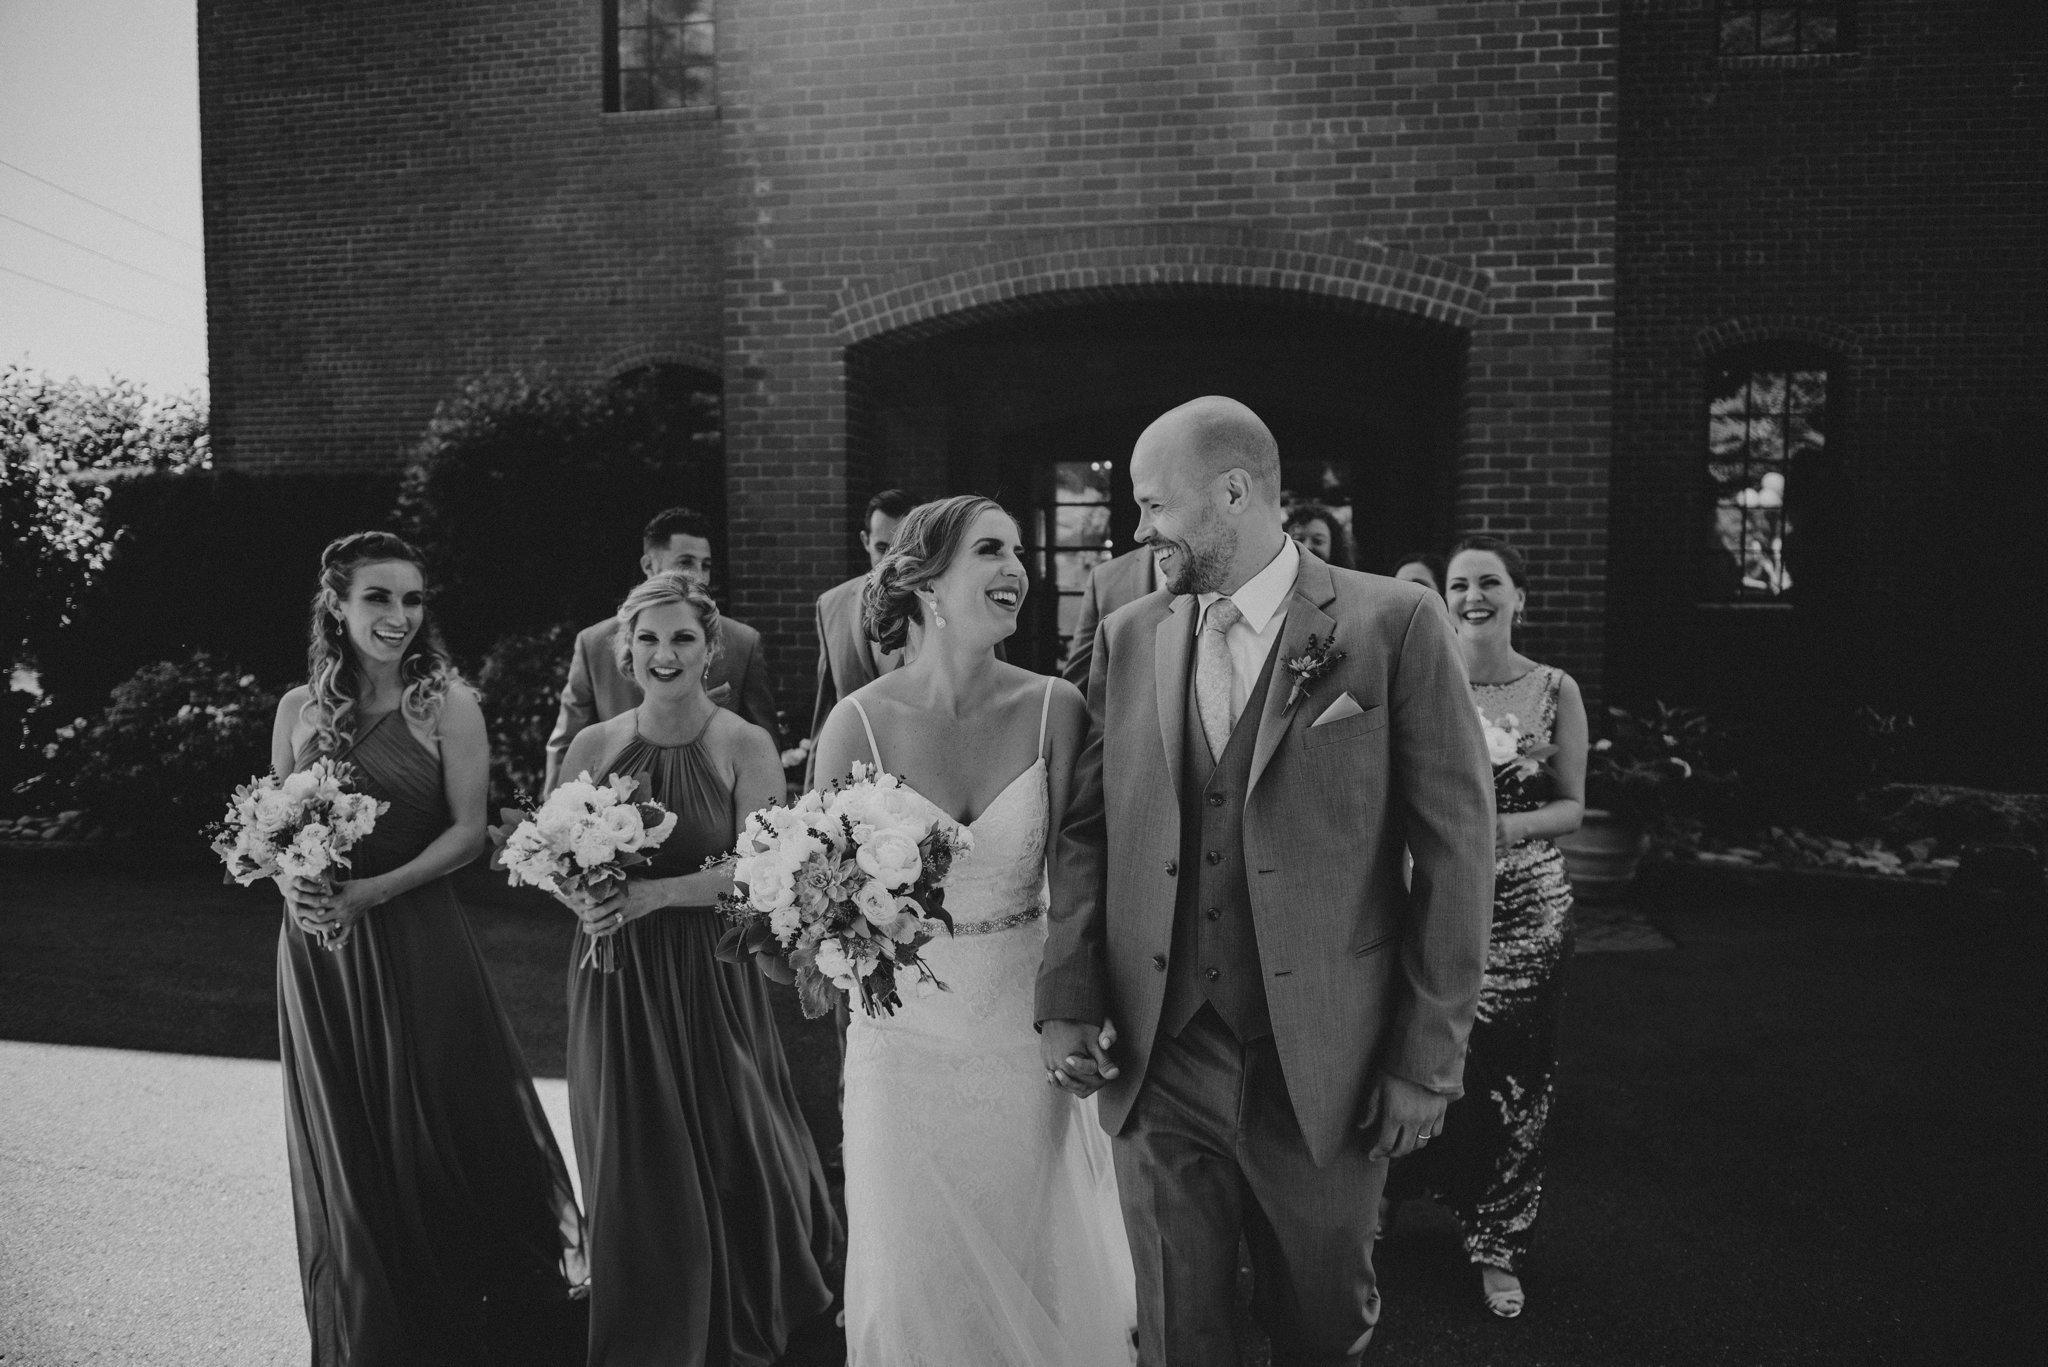 hollywood-school-house-wedding-seattle-photographer-caitlyn-nikula-53.jpg